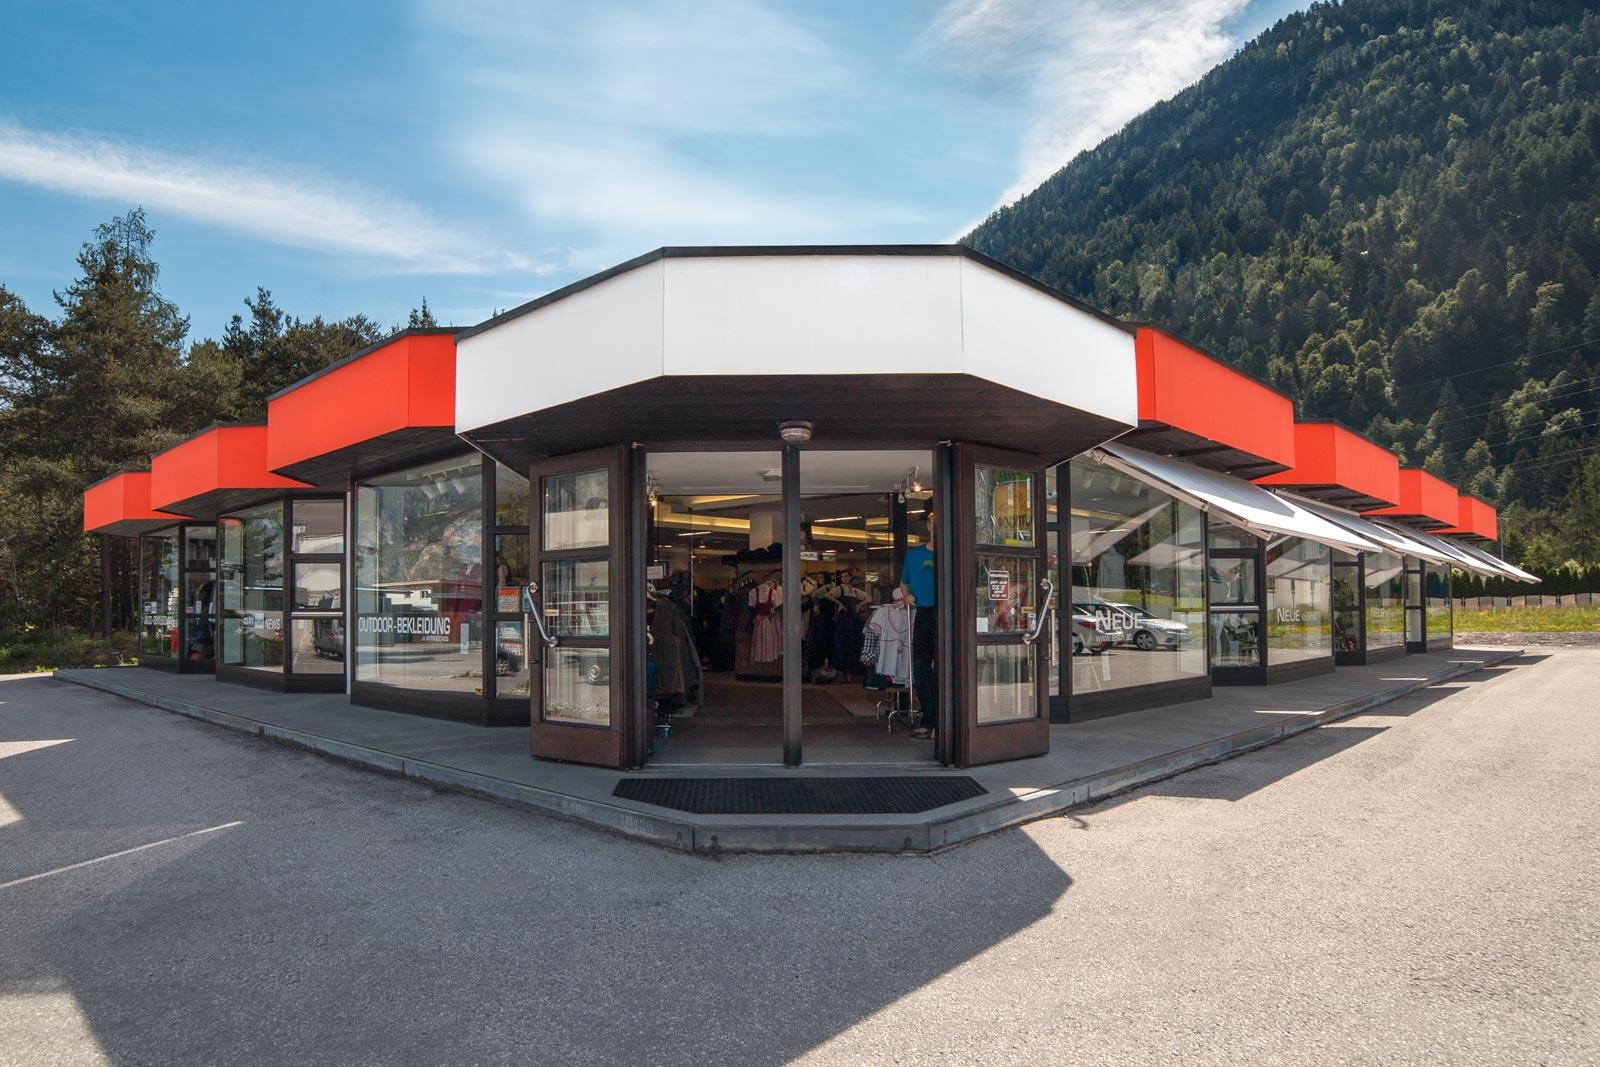 Werbeagentur - agentur 13 Tirol, astri Fotografie